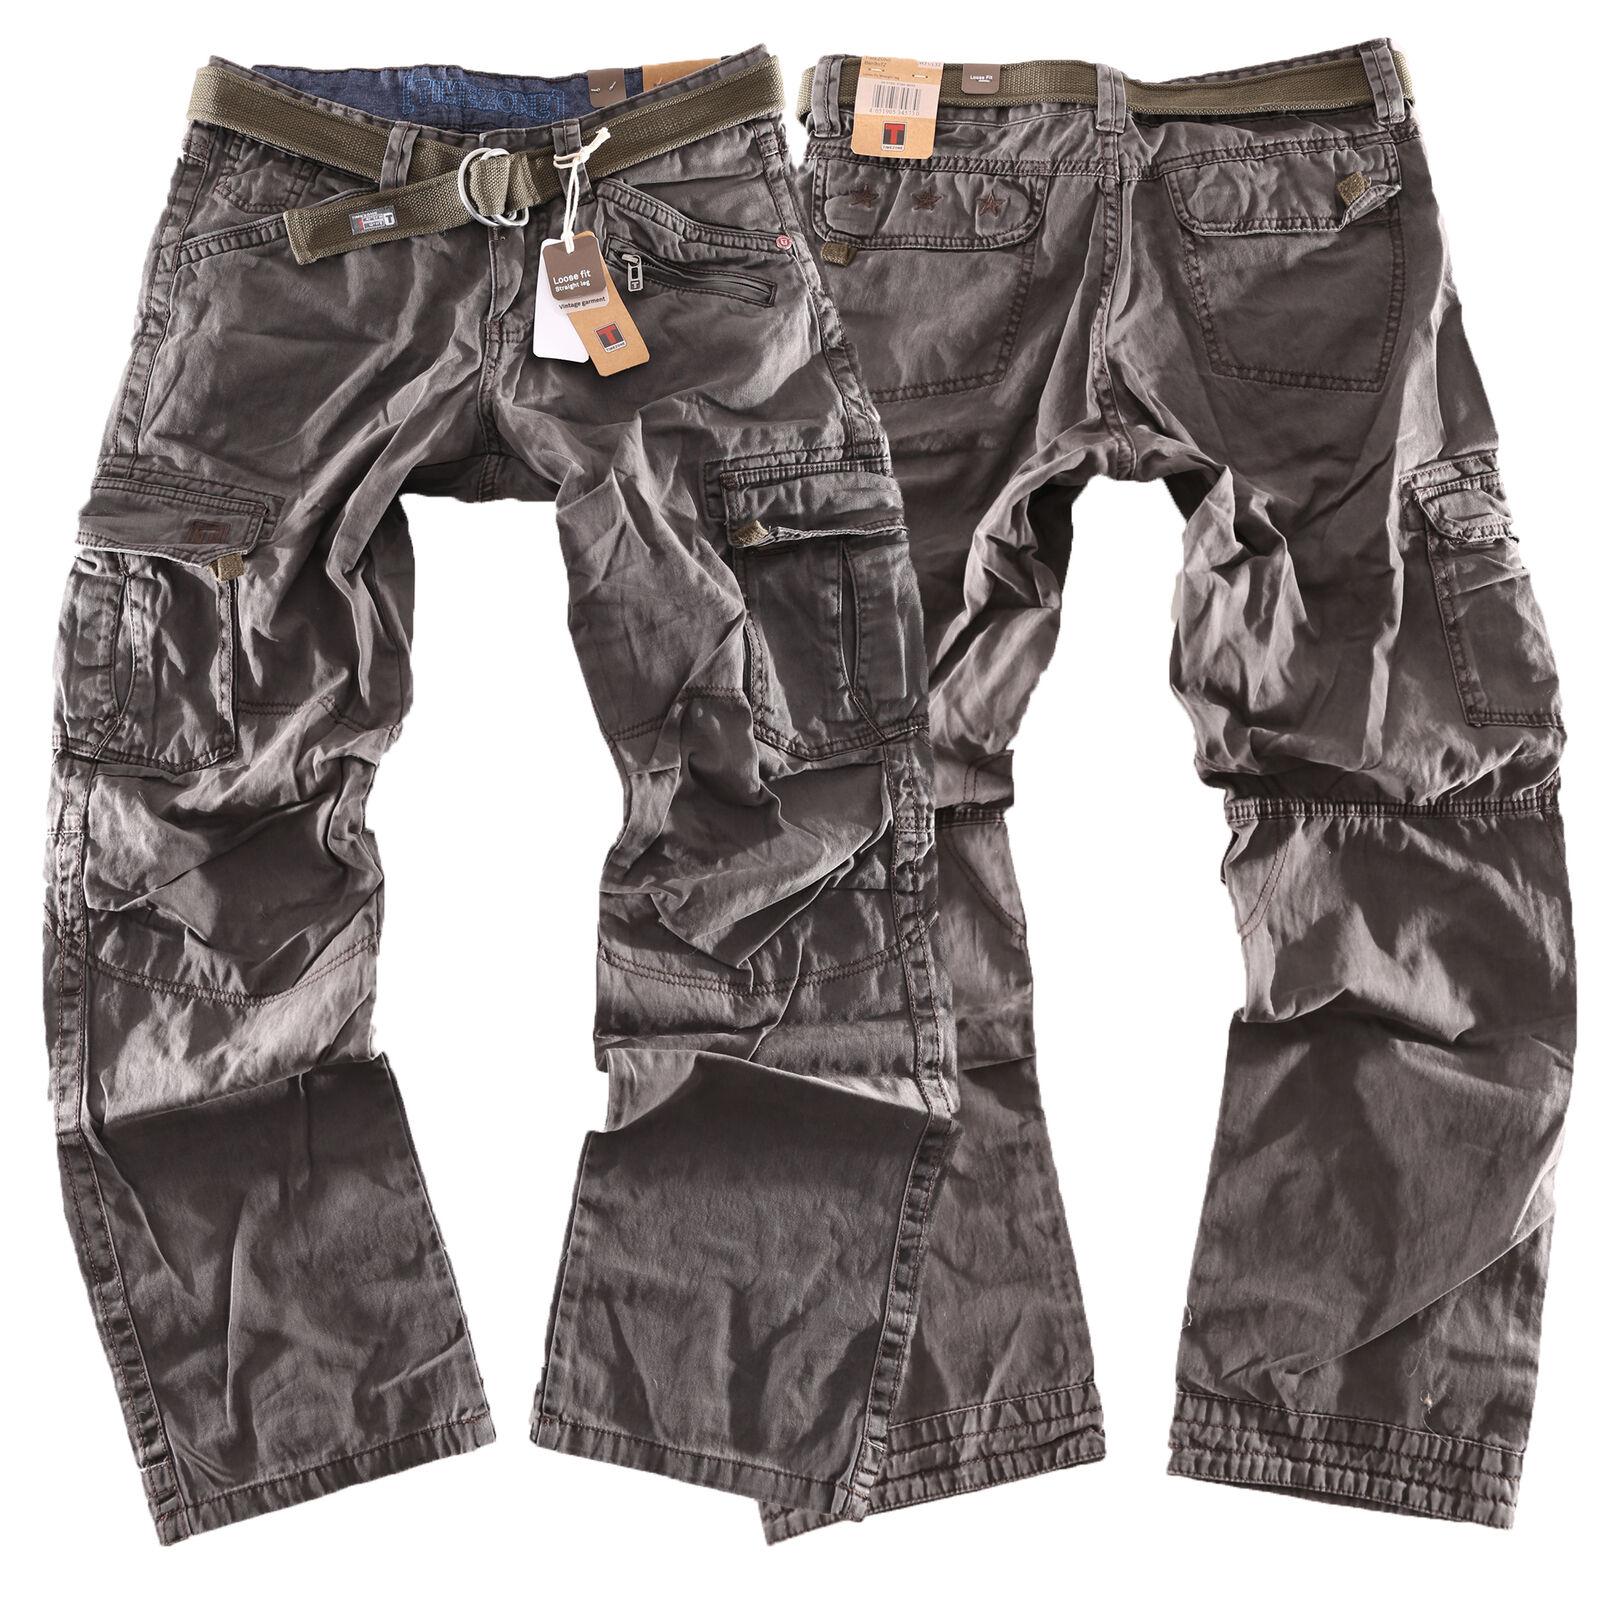 Timezone Herren Hose Benito TZ 9033 Neu 2018 Cargohose Jeans Größen wählbar b7f2c53176